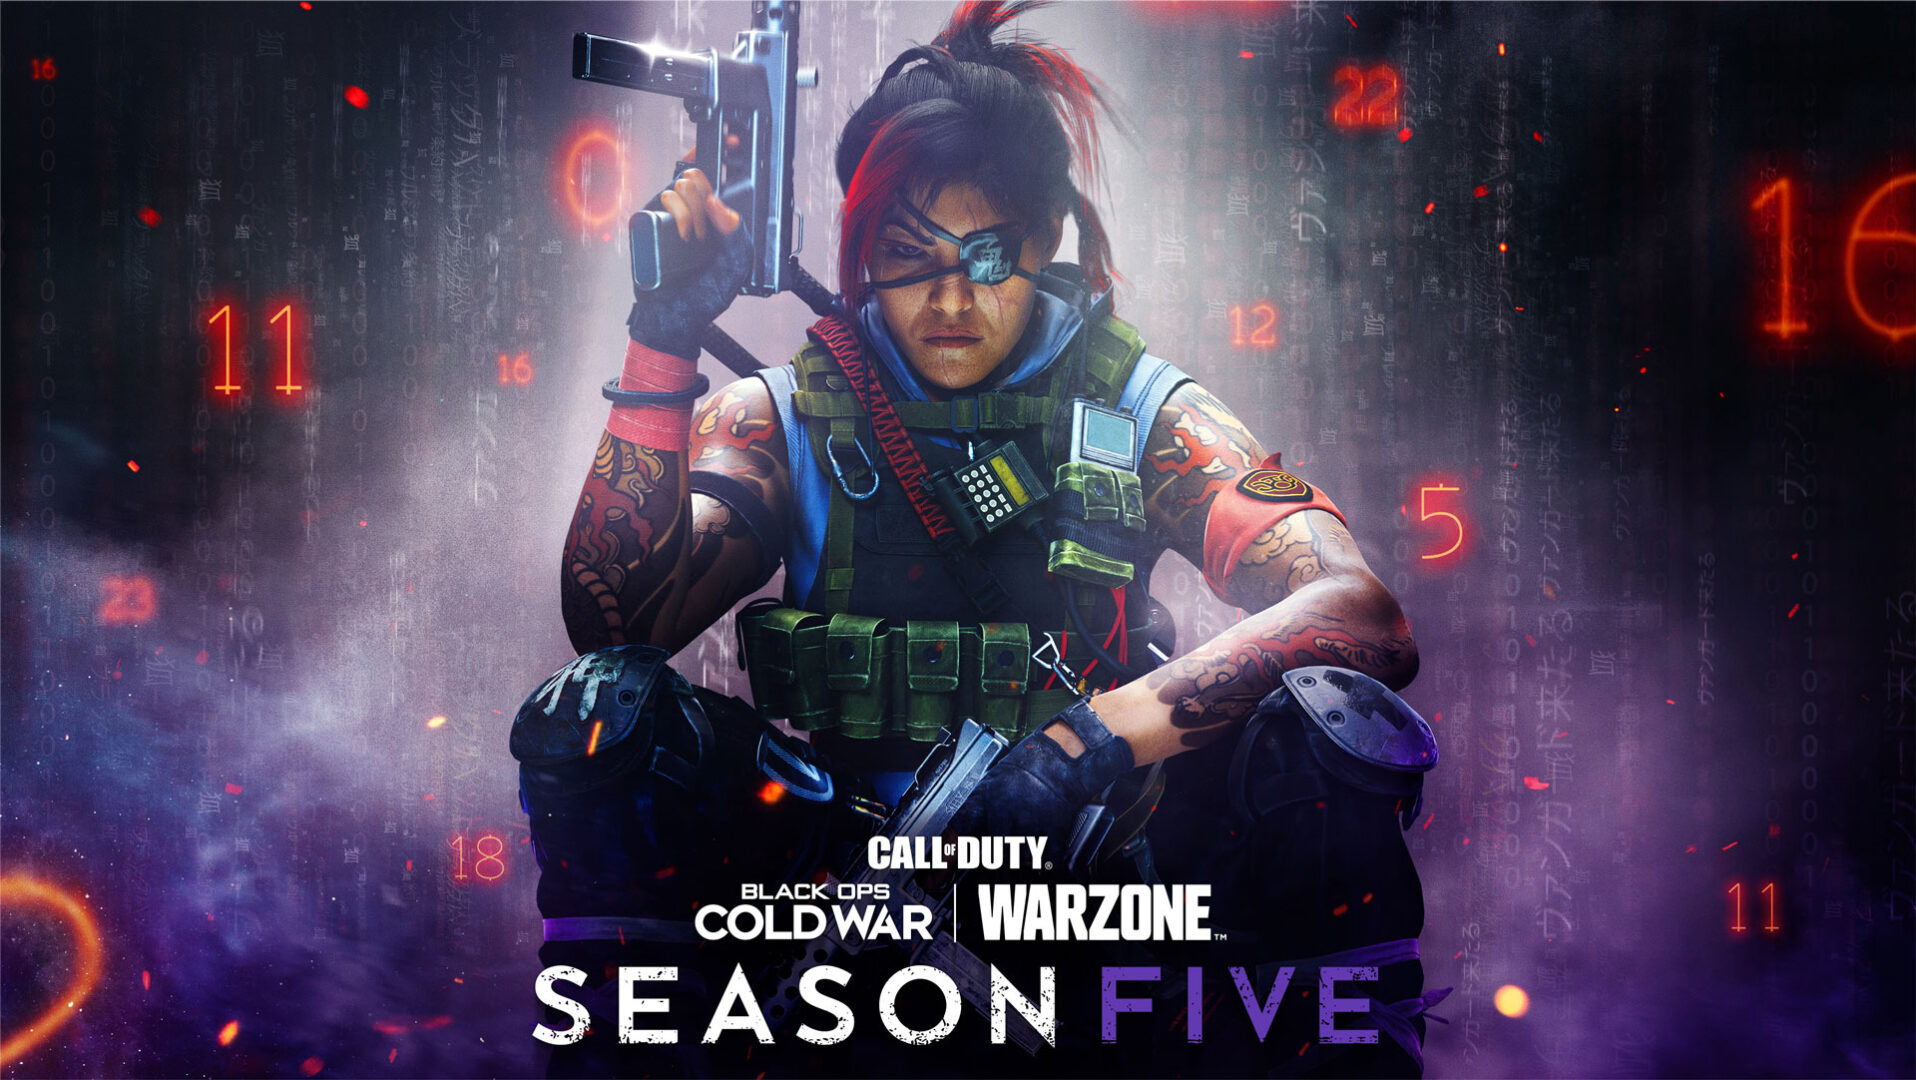 Season 5 patch notes